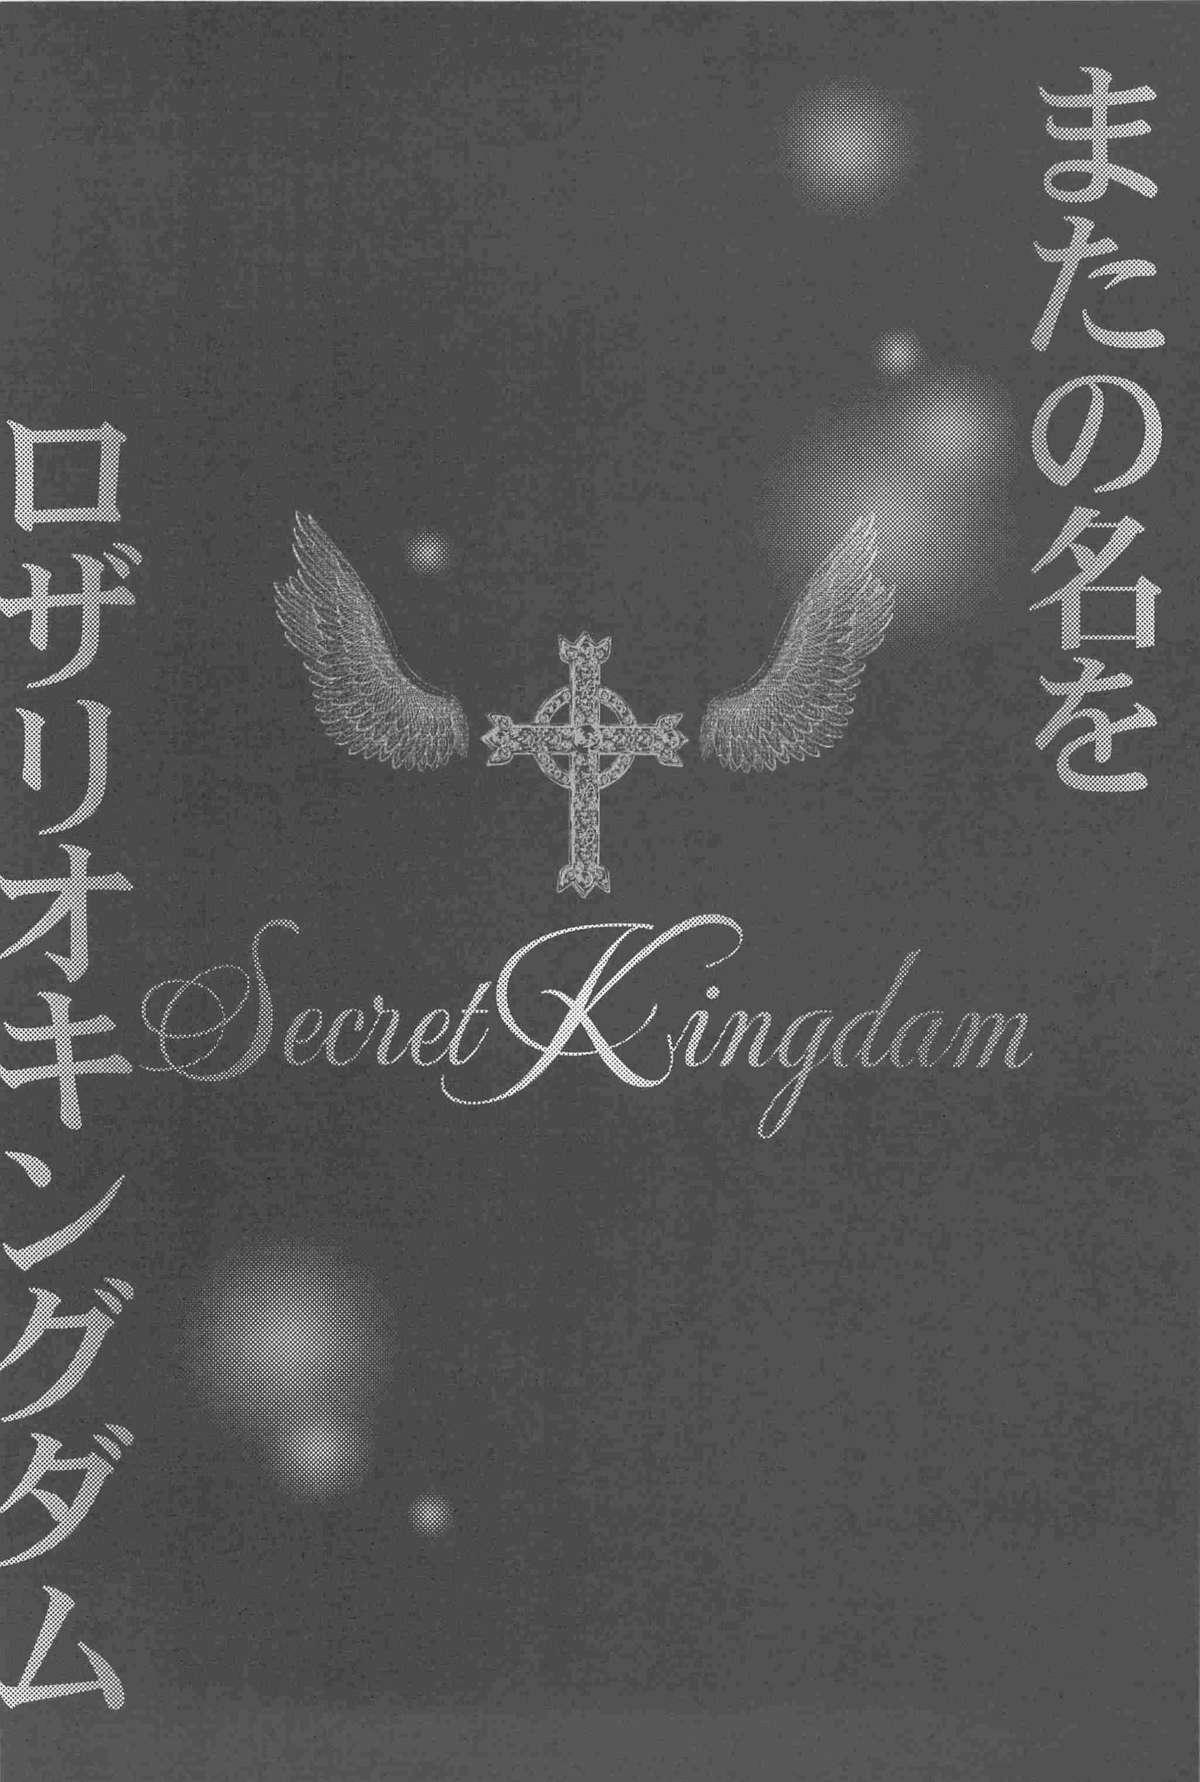 Secret Kingdom 3